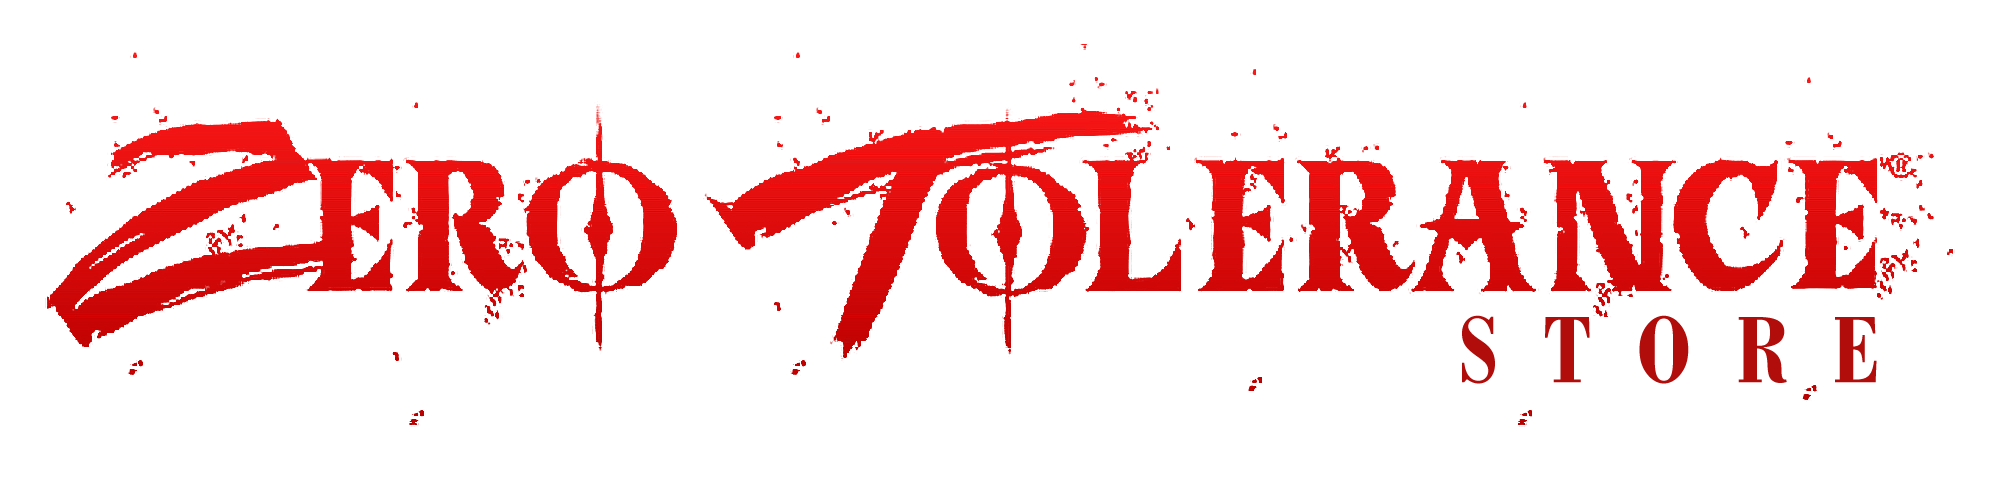 Zero Tolerance Sex 70